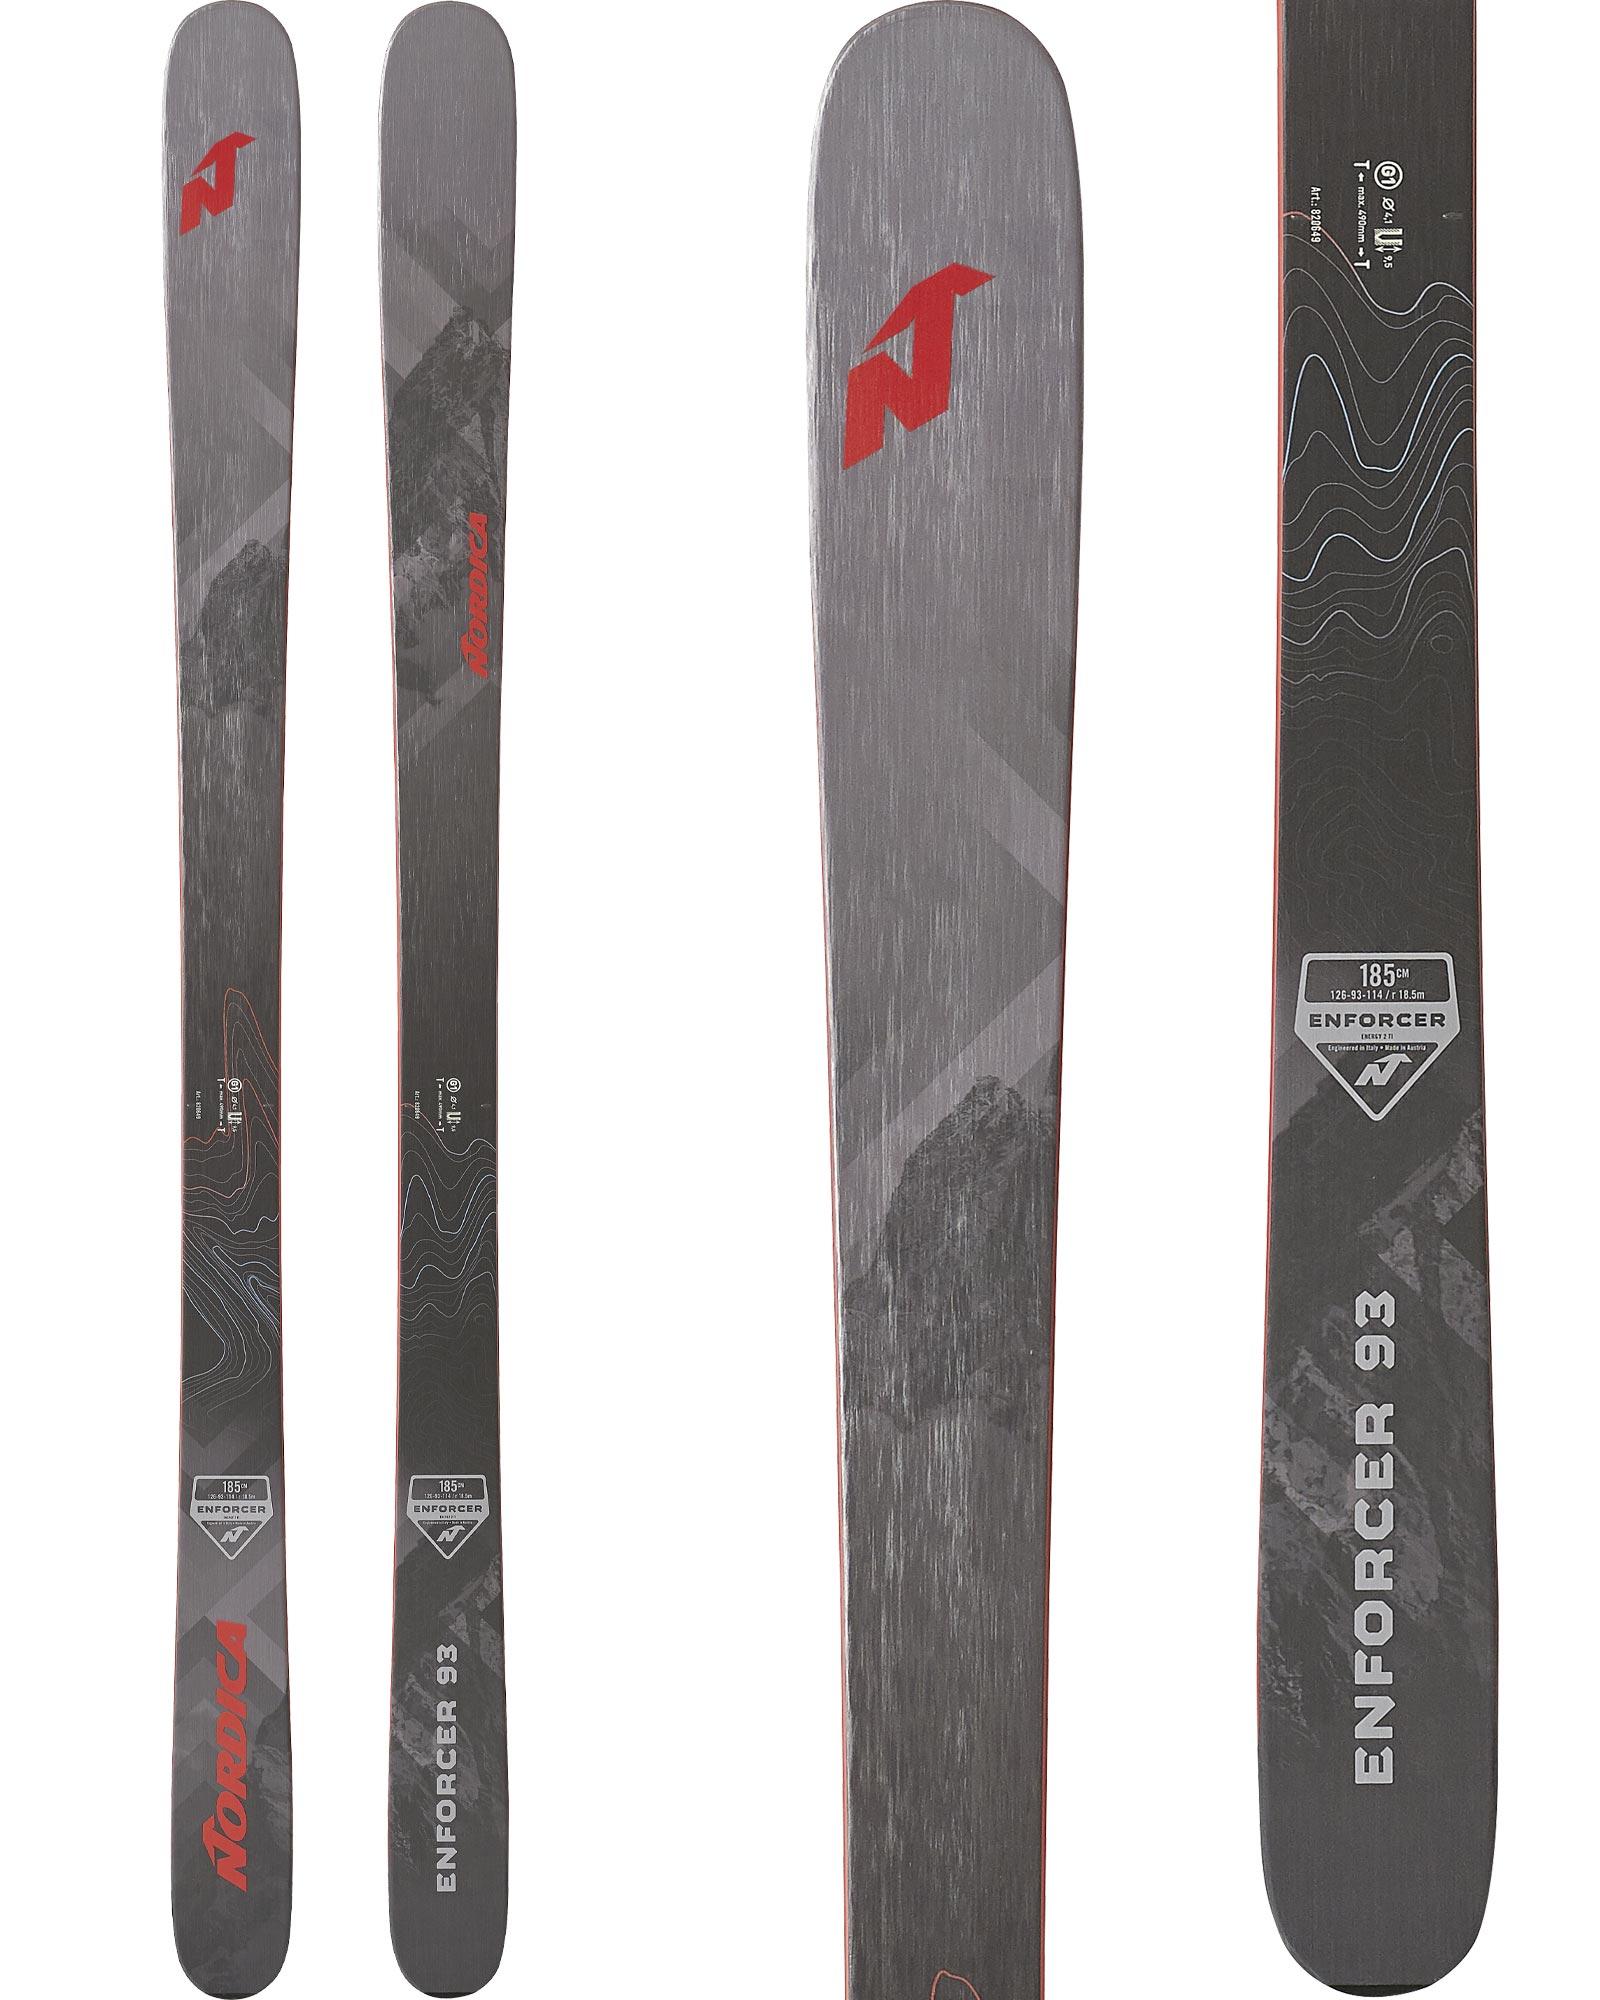 Nordica Men's Enforcer 93 Freeride Skis 2019 / 2020 0